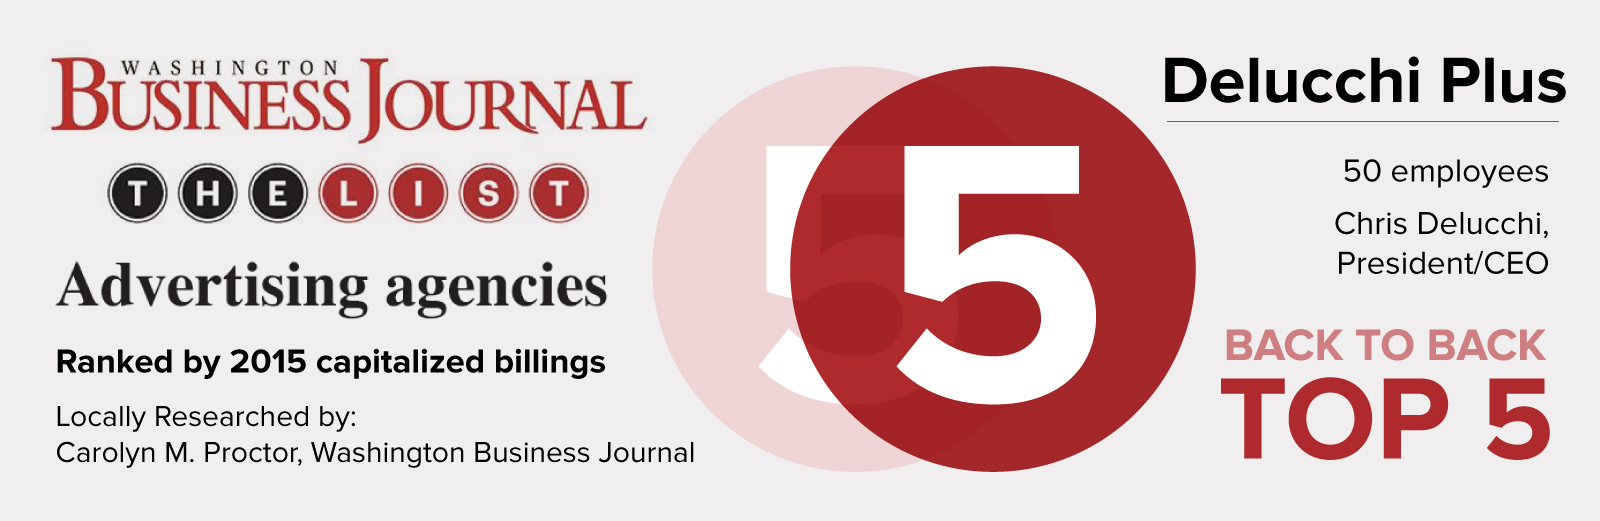 washington-business-journal-2015-top-5-banner